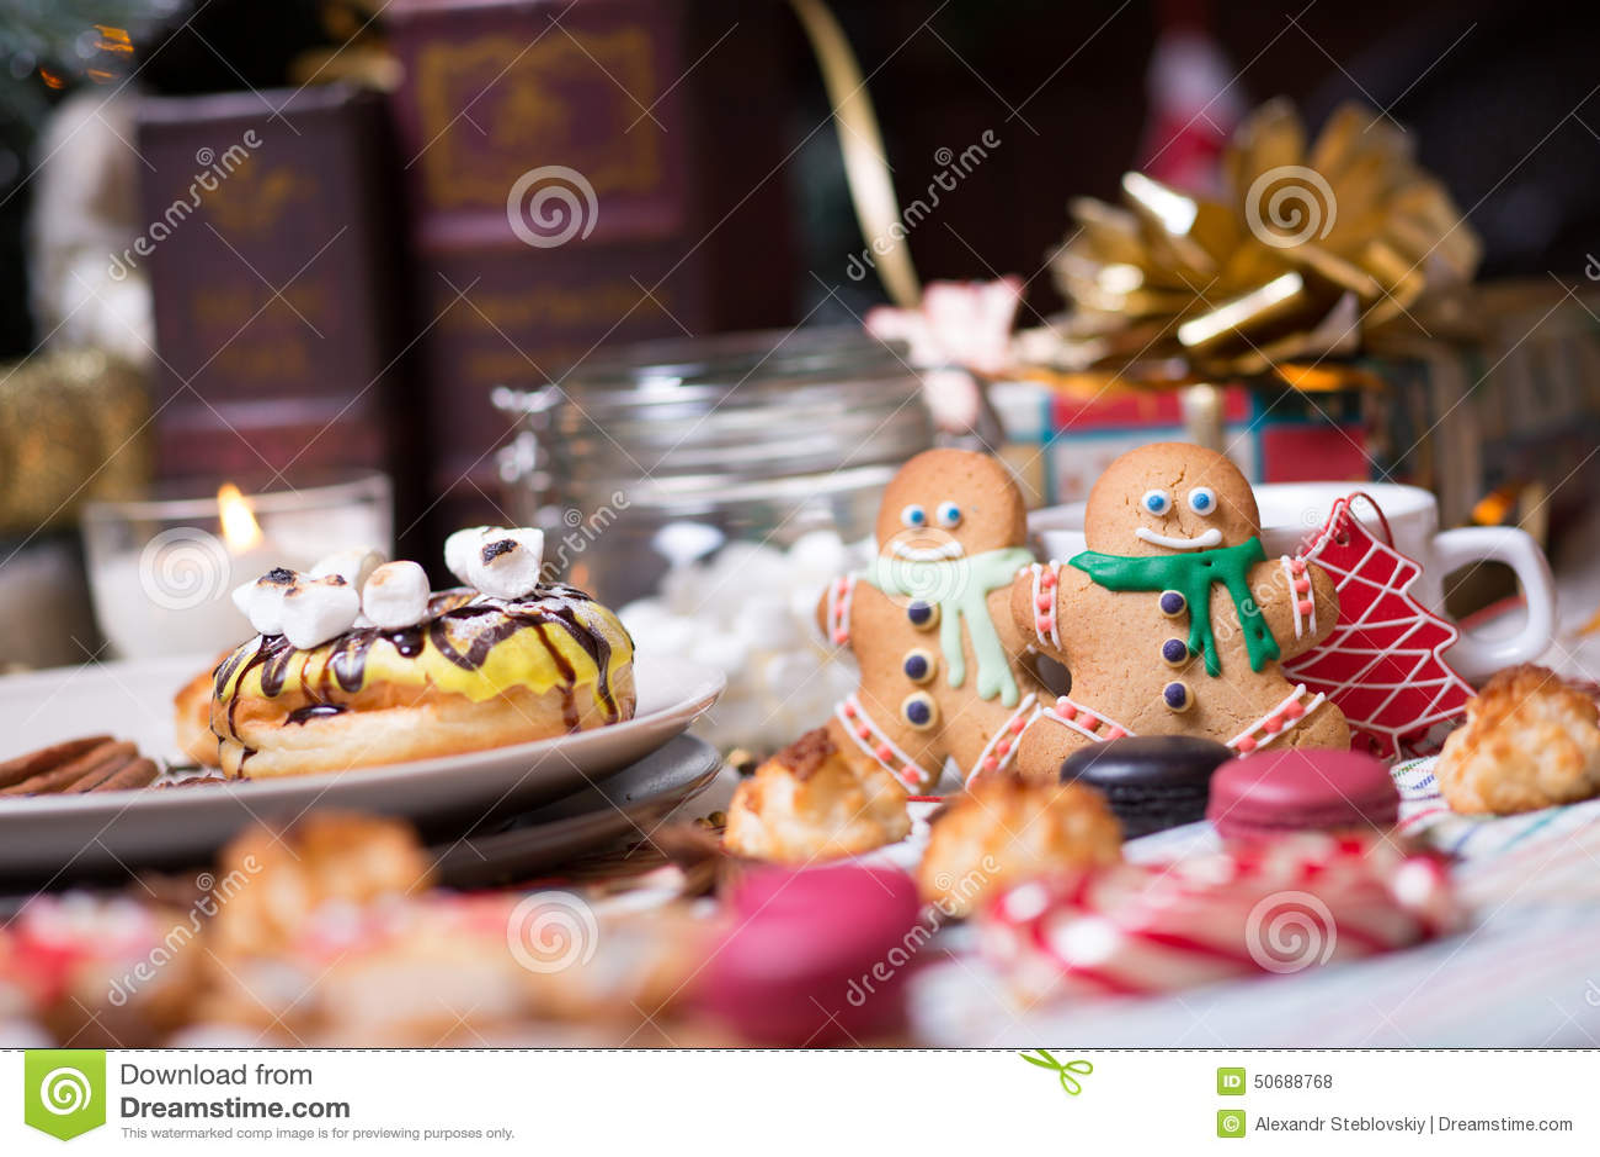 Download 圣诞节曲奇饼姜饼做宫殿甜点 库存照片. 图片 包括有 魔术, 果子, annabelle, 颜色, 会议室 - 50688768